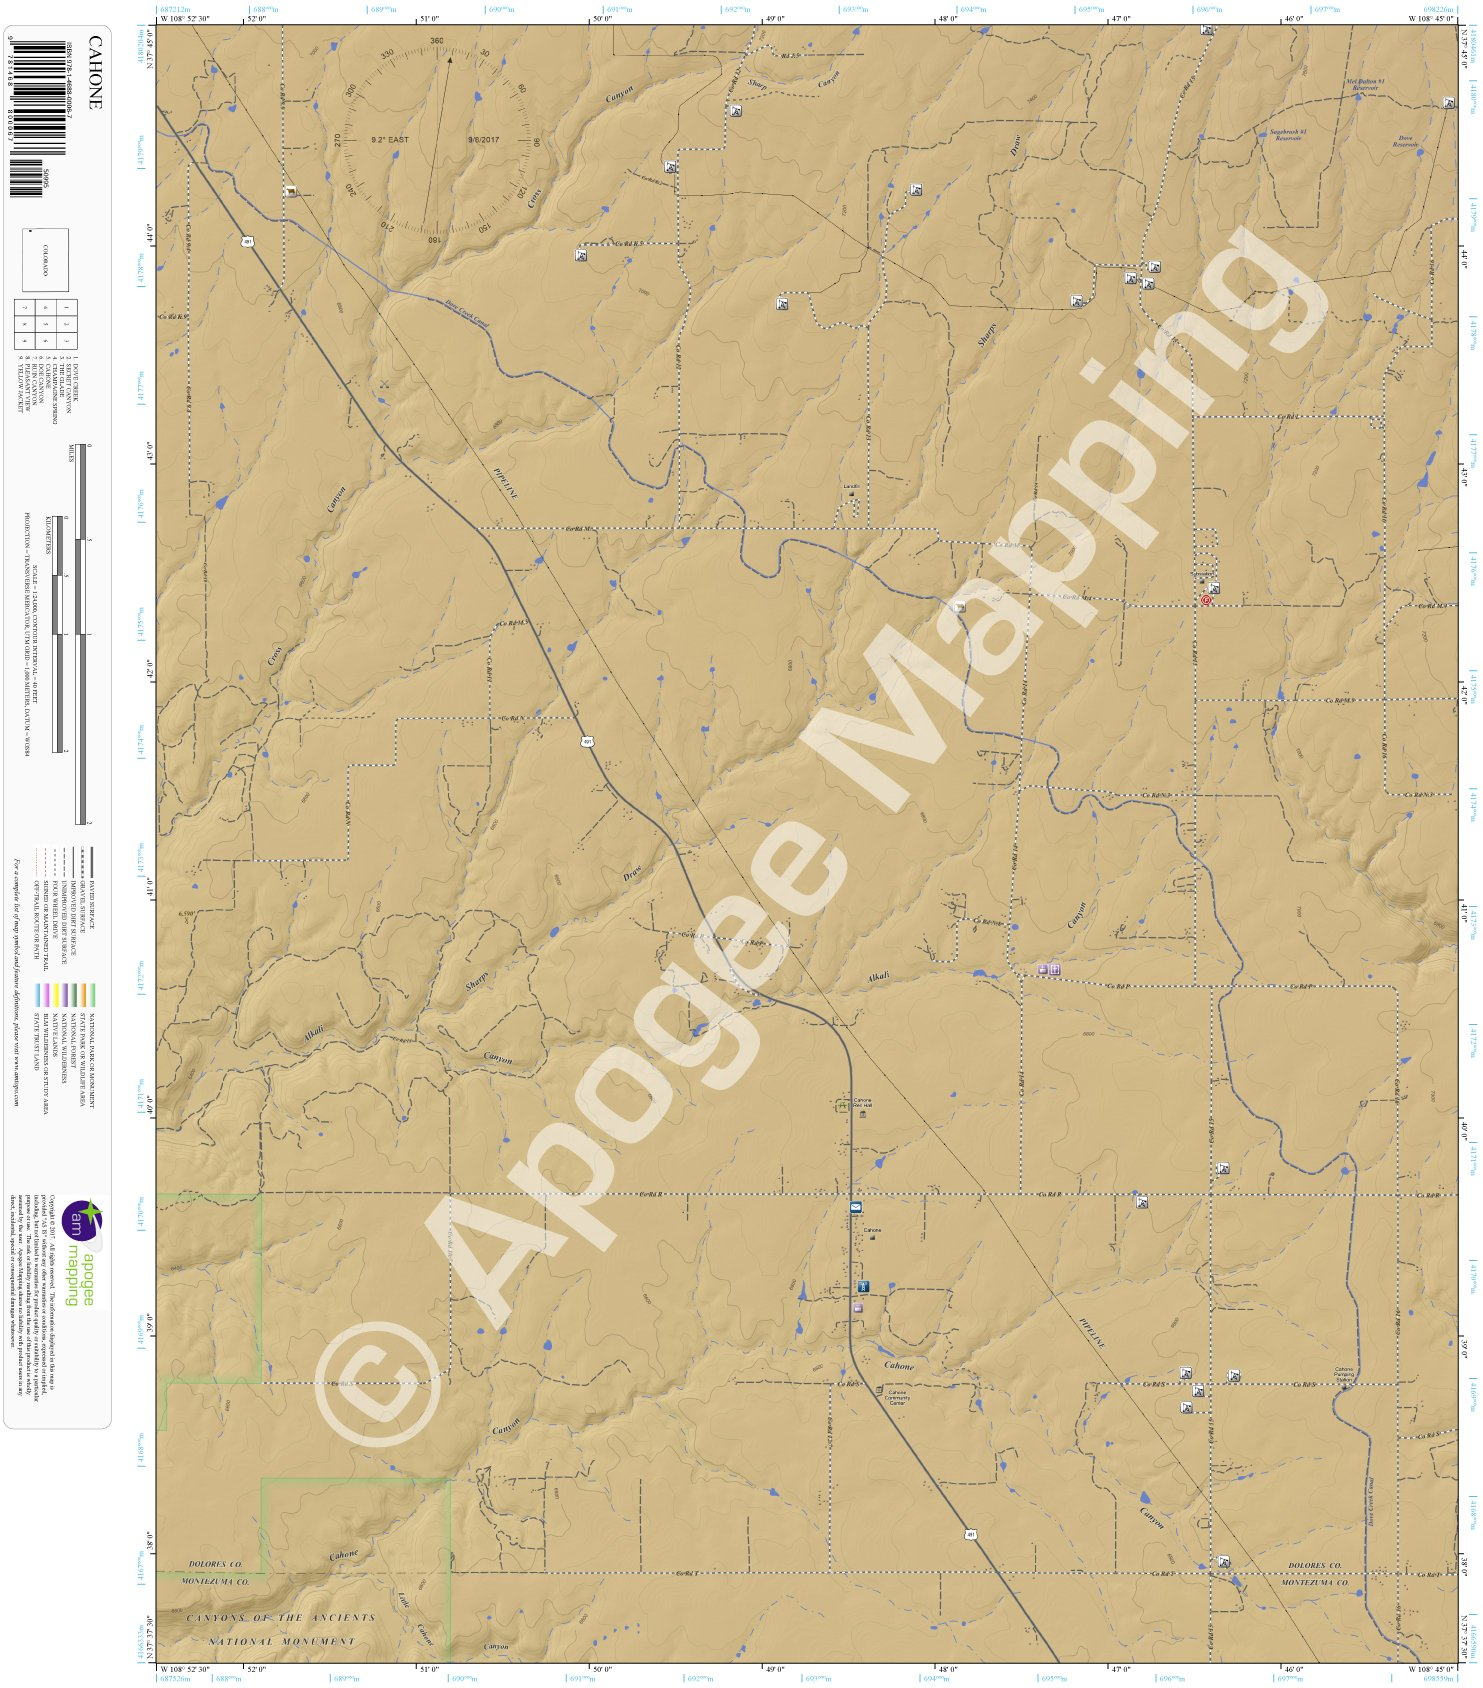 Download Cahone, Colorado 7.5 Minute Topographic Map - Waterproof Paper pdf